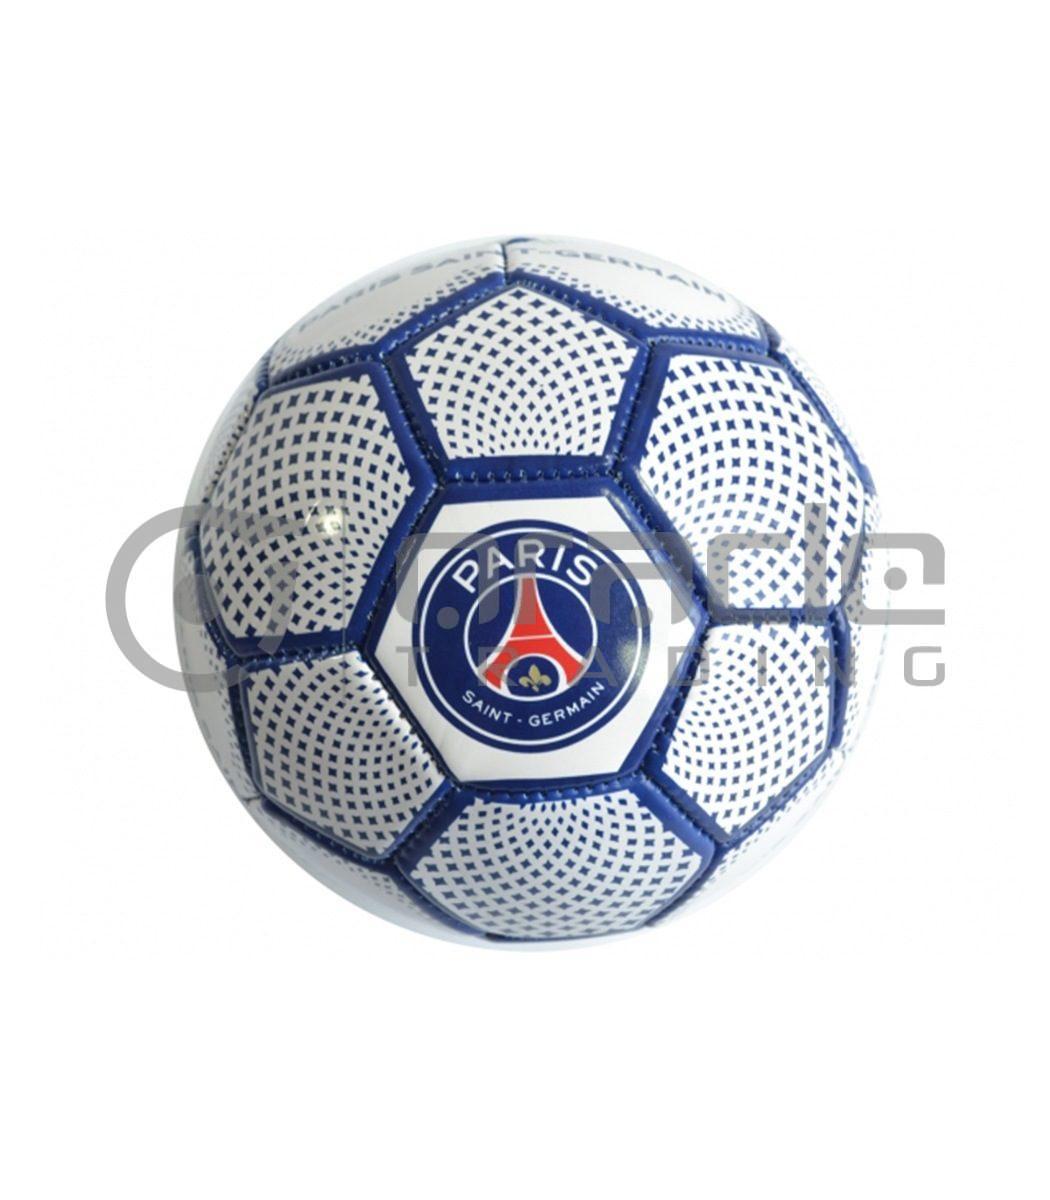 PSG Mini Soccer Ball